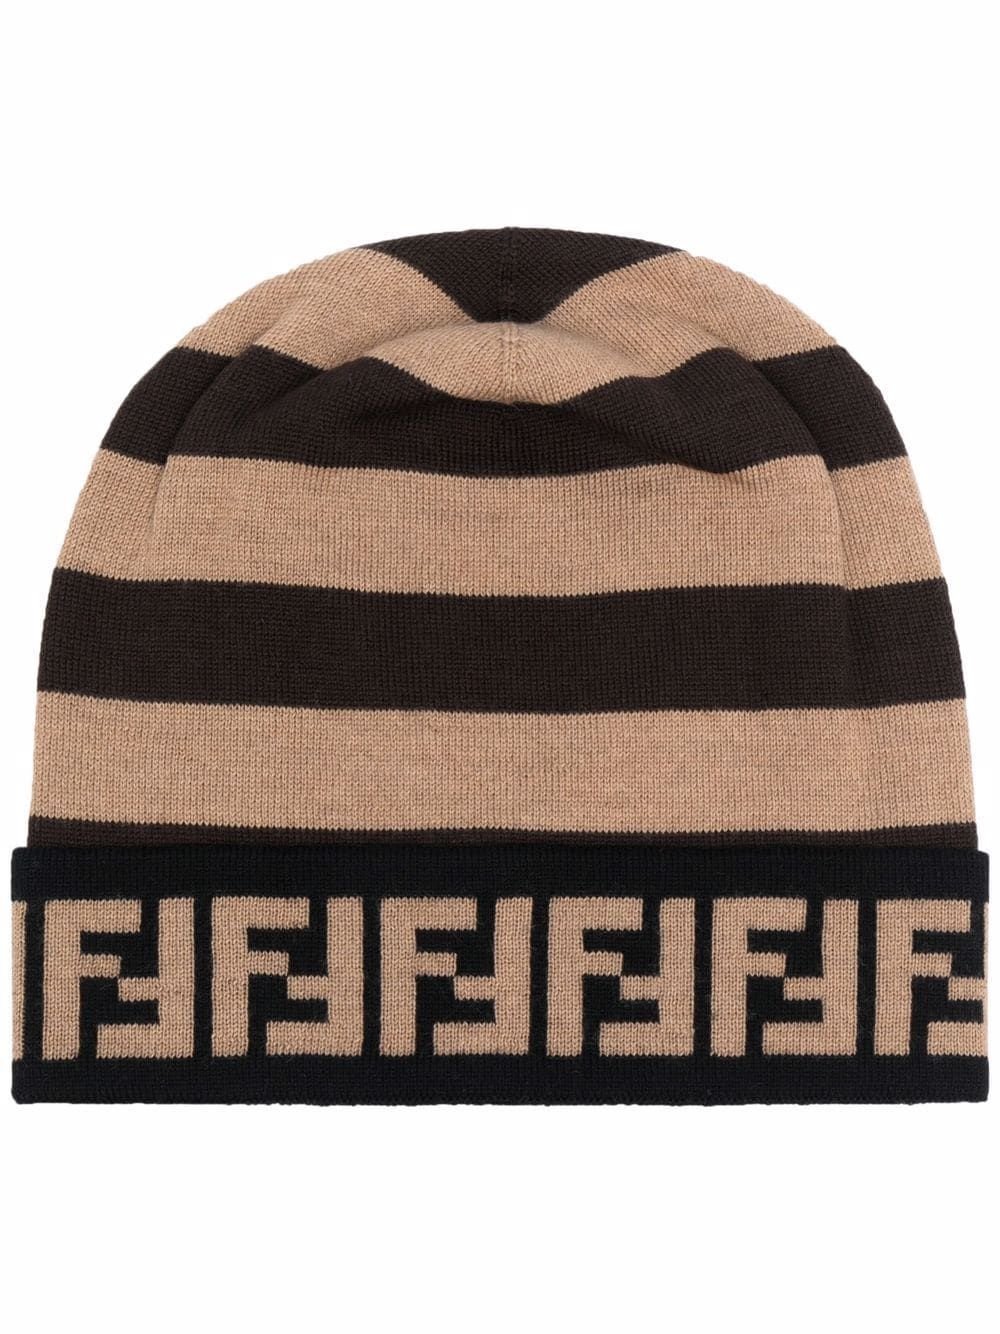 Fendi cappelli marrone